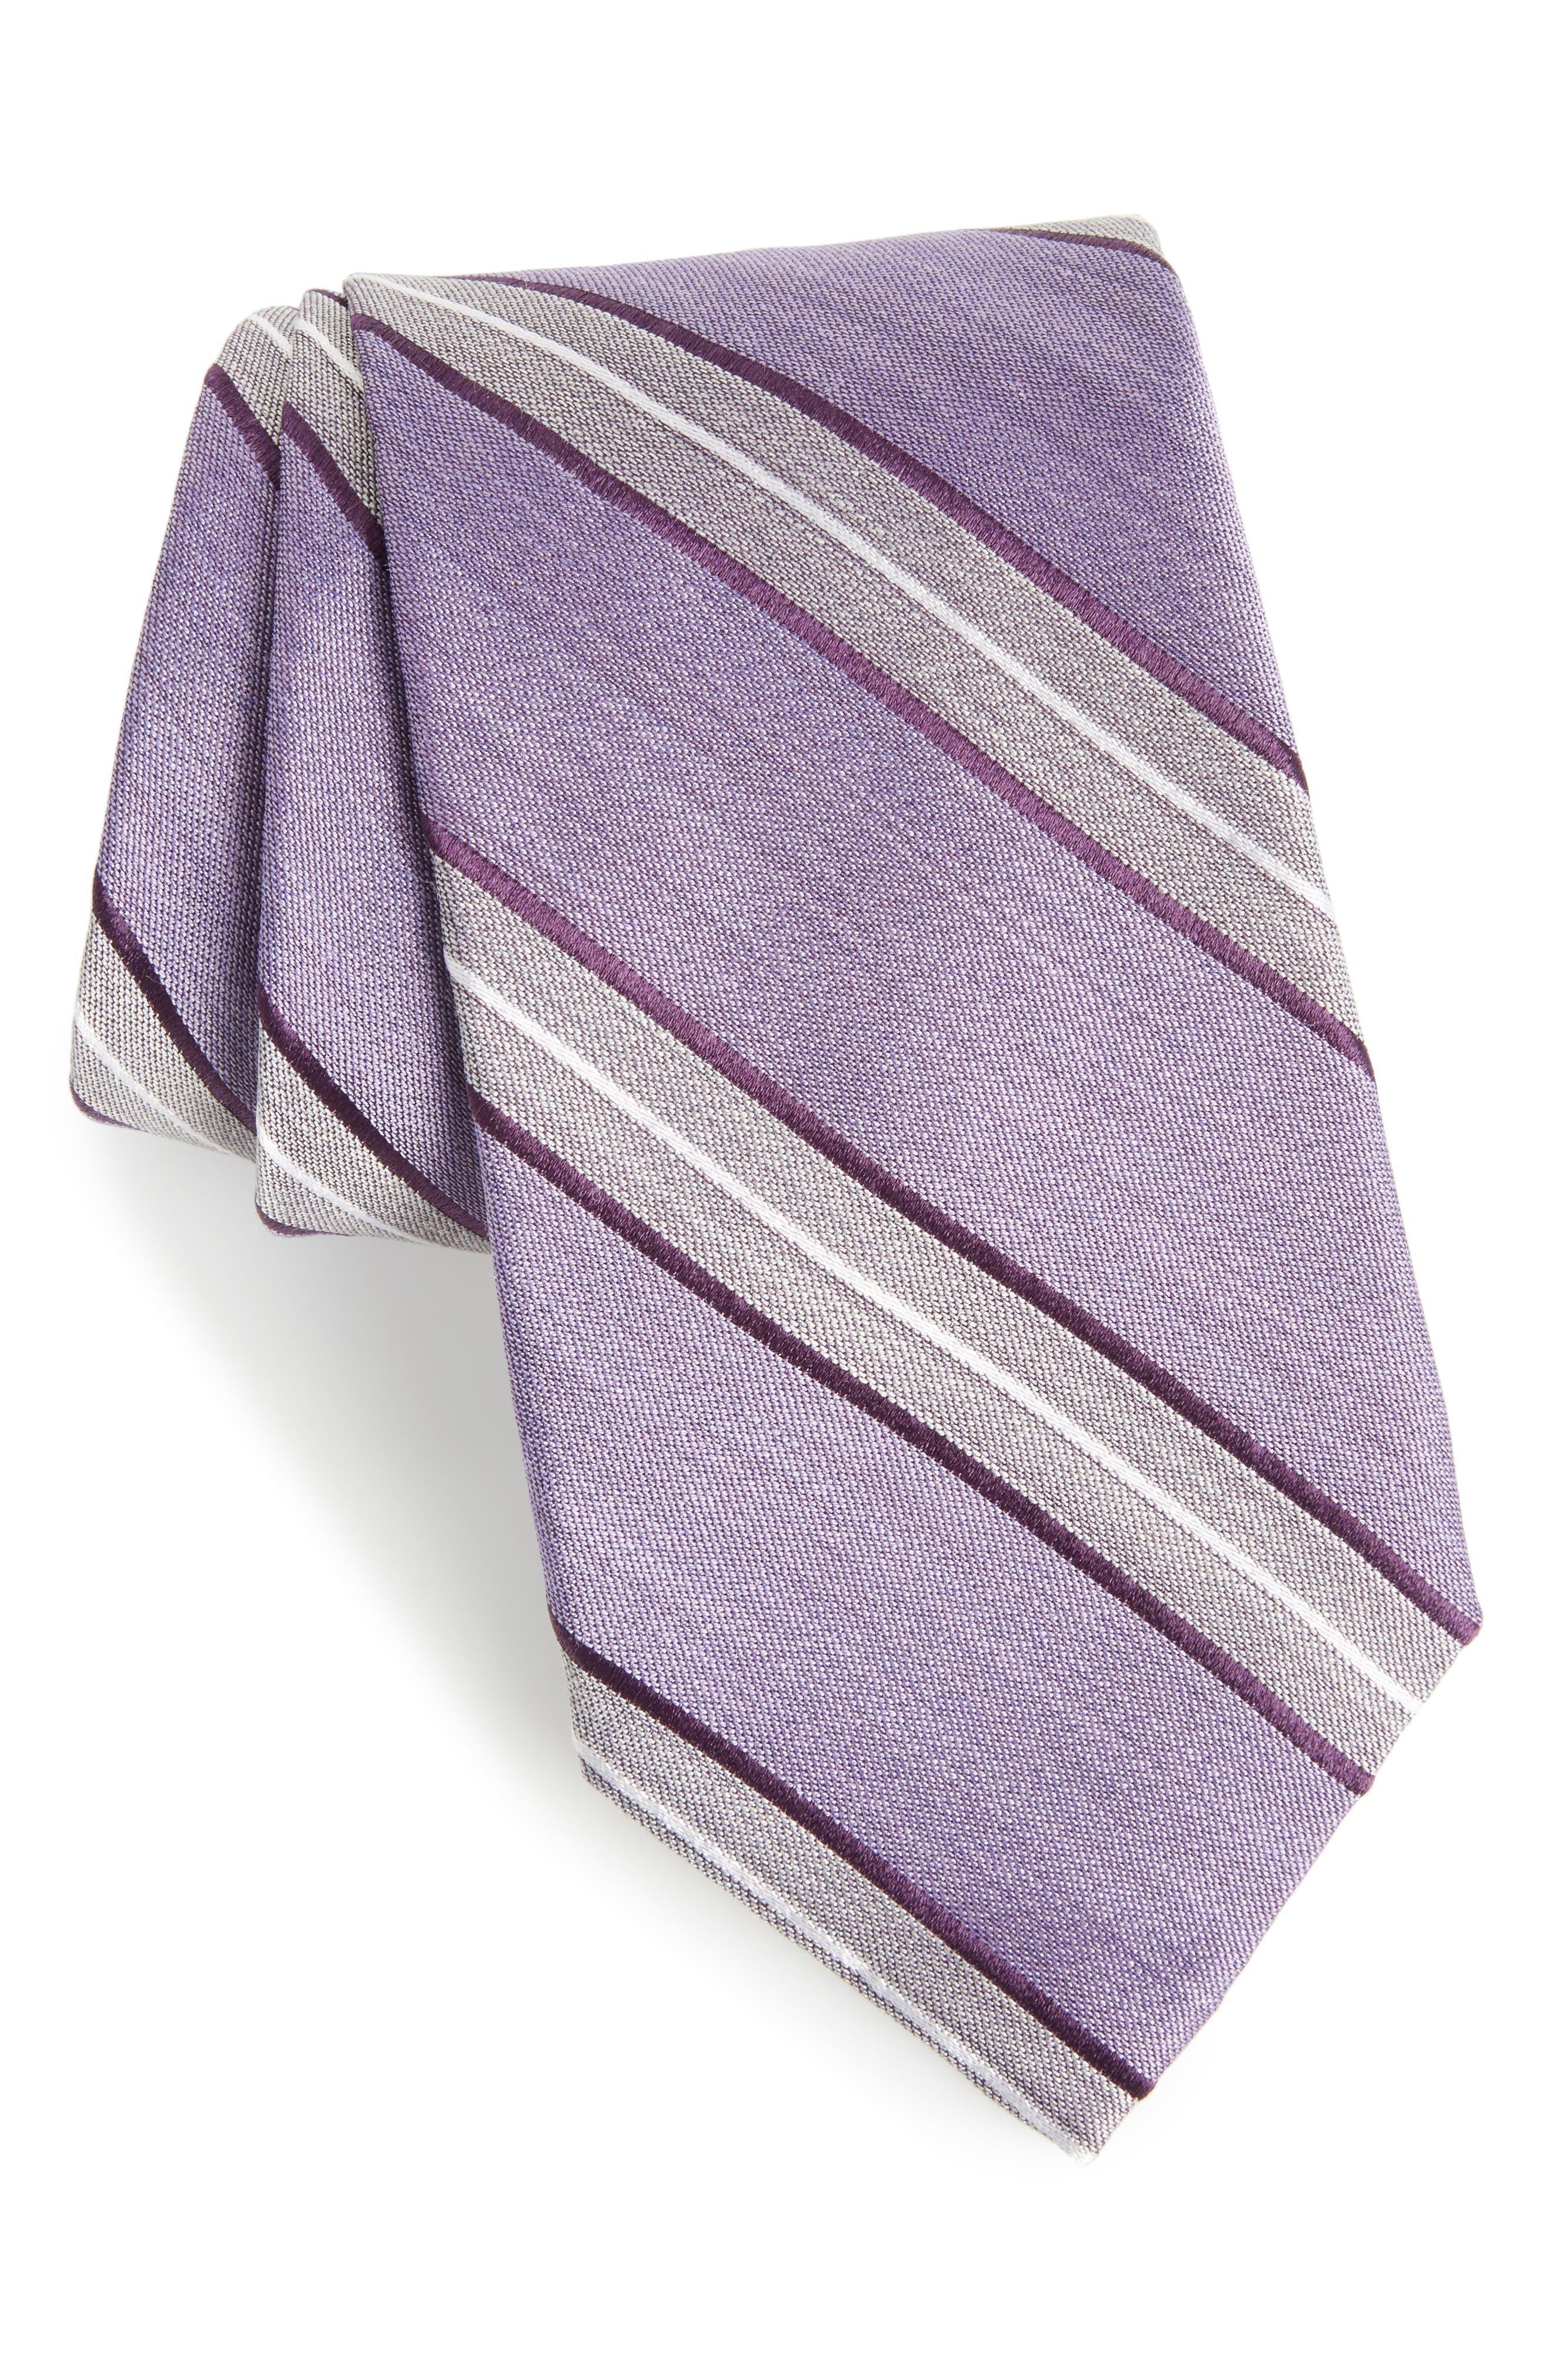 Alternate Image 1 Selected - Nordstrom Men's Shop Peralba Stripe Silk Blend Tie